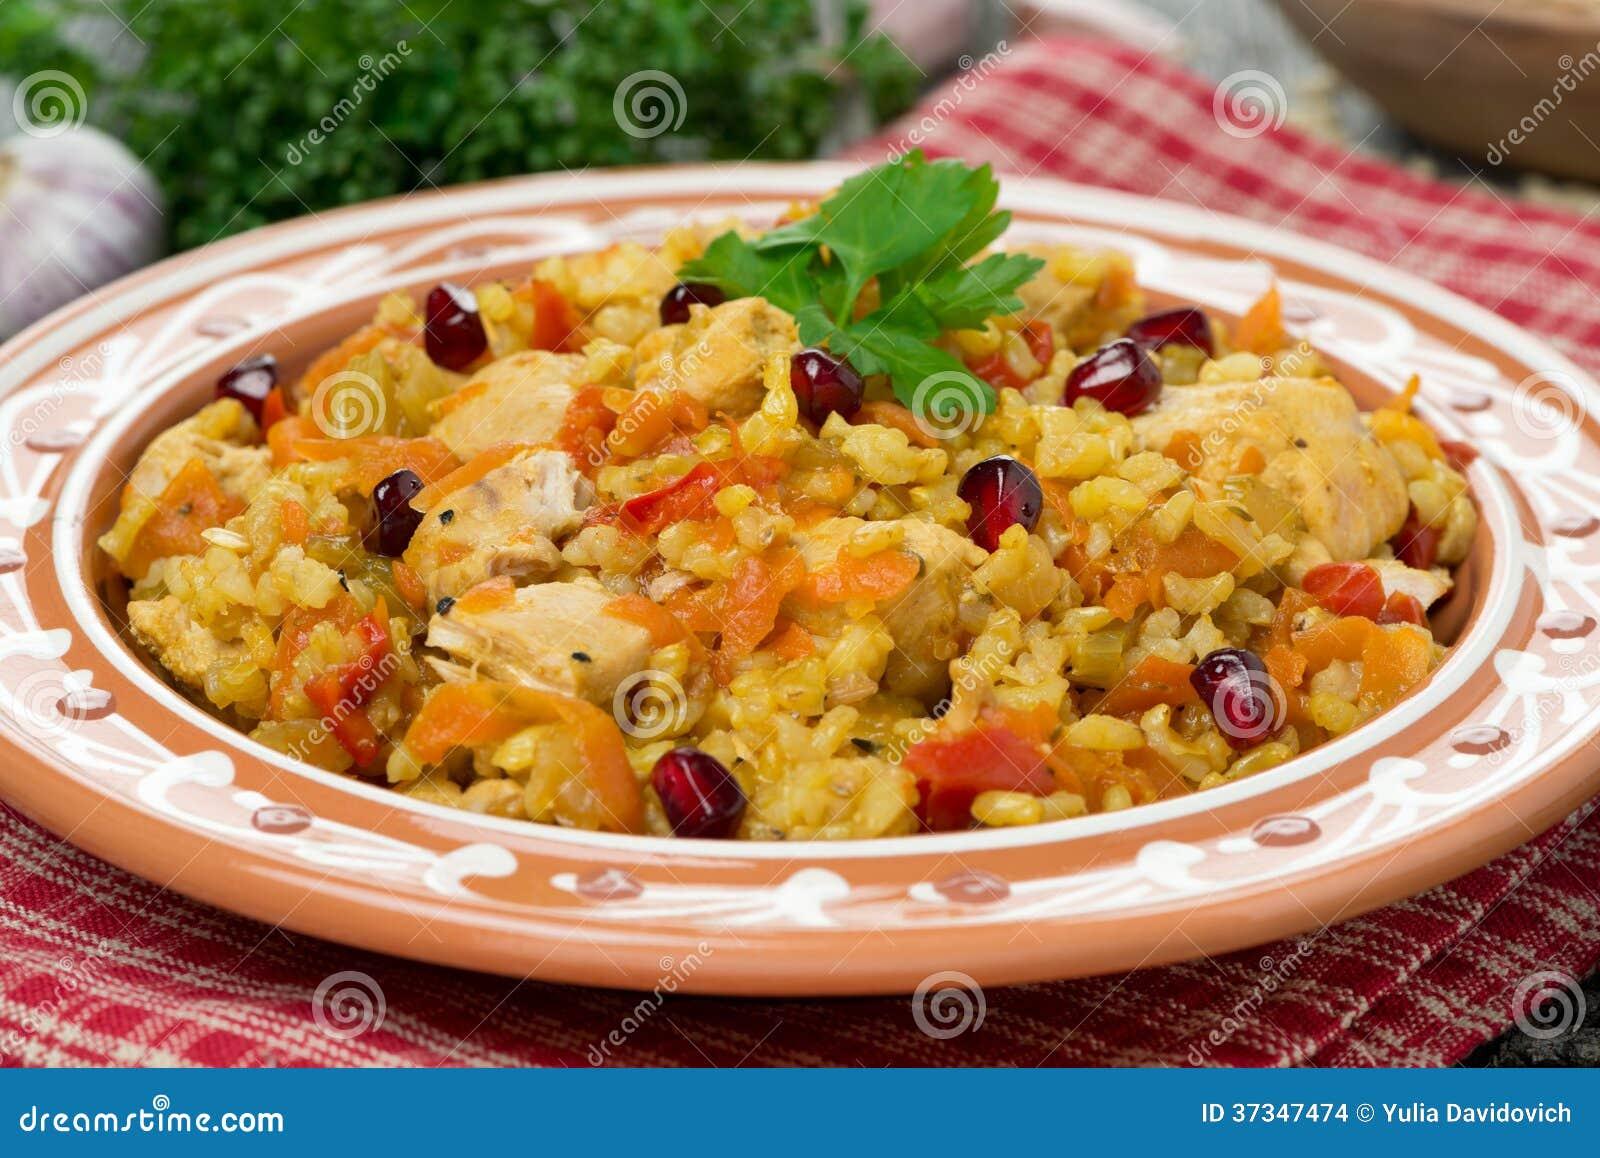 Pilaf με τα λαχανικά, το κοτόπουλο και το ρόδι, κινηματογράφηση σε πρώτο πλάνο